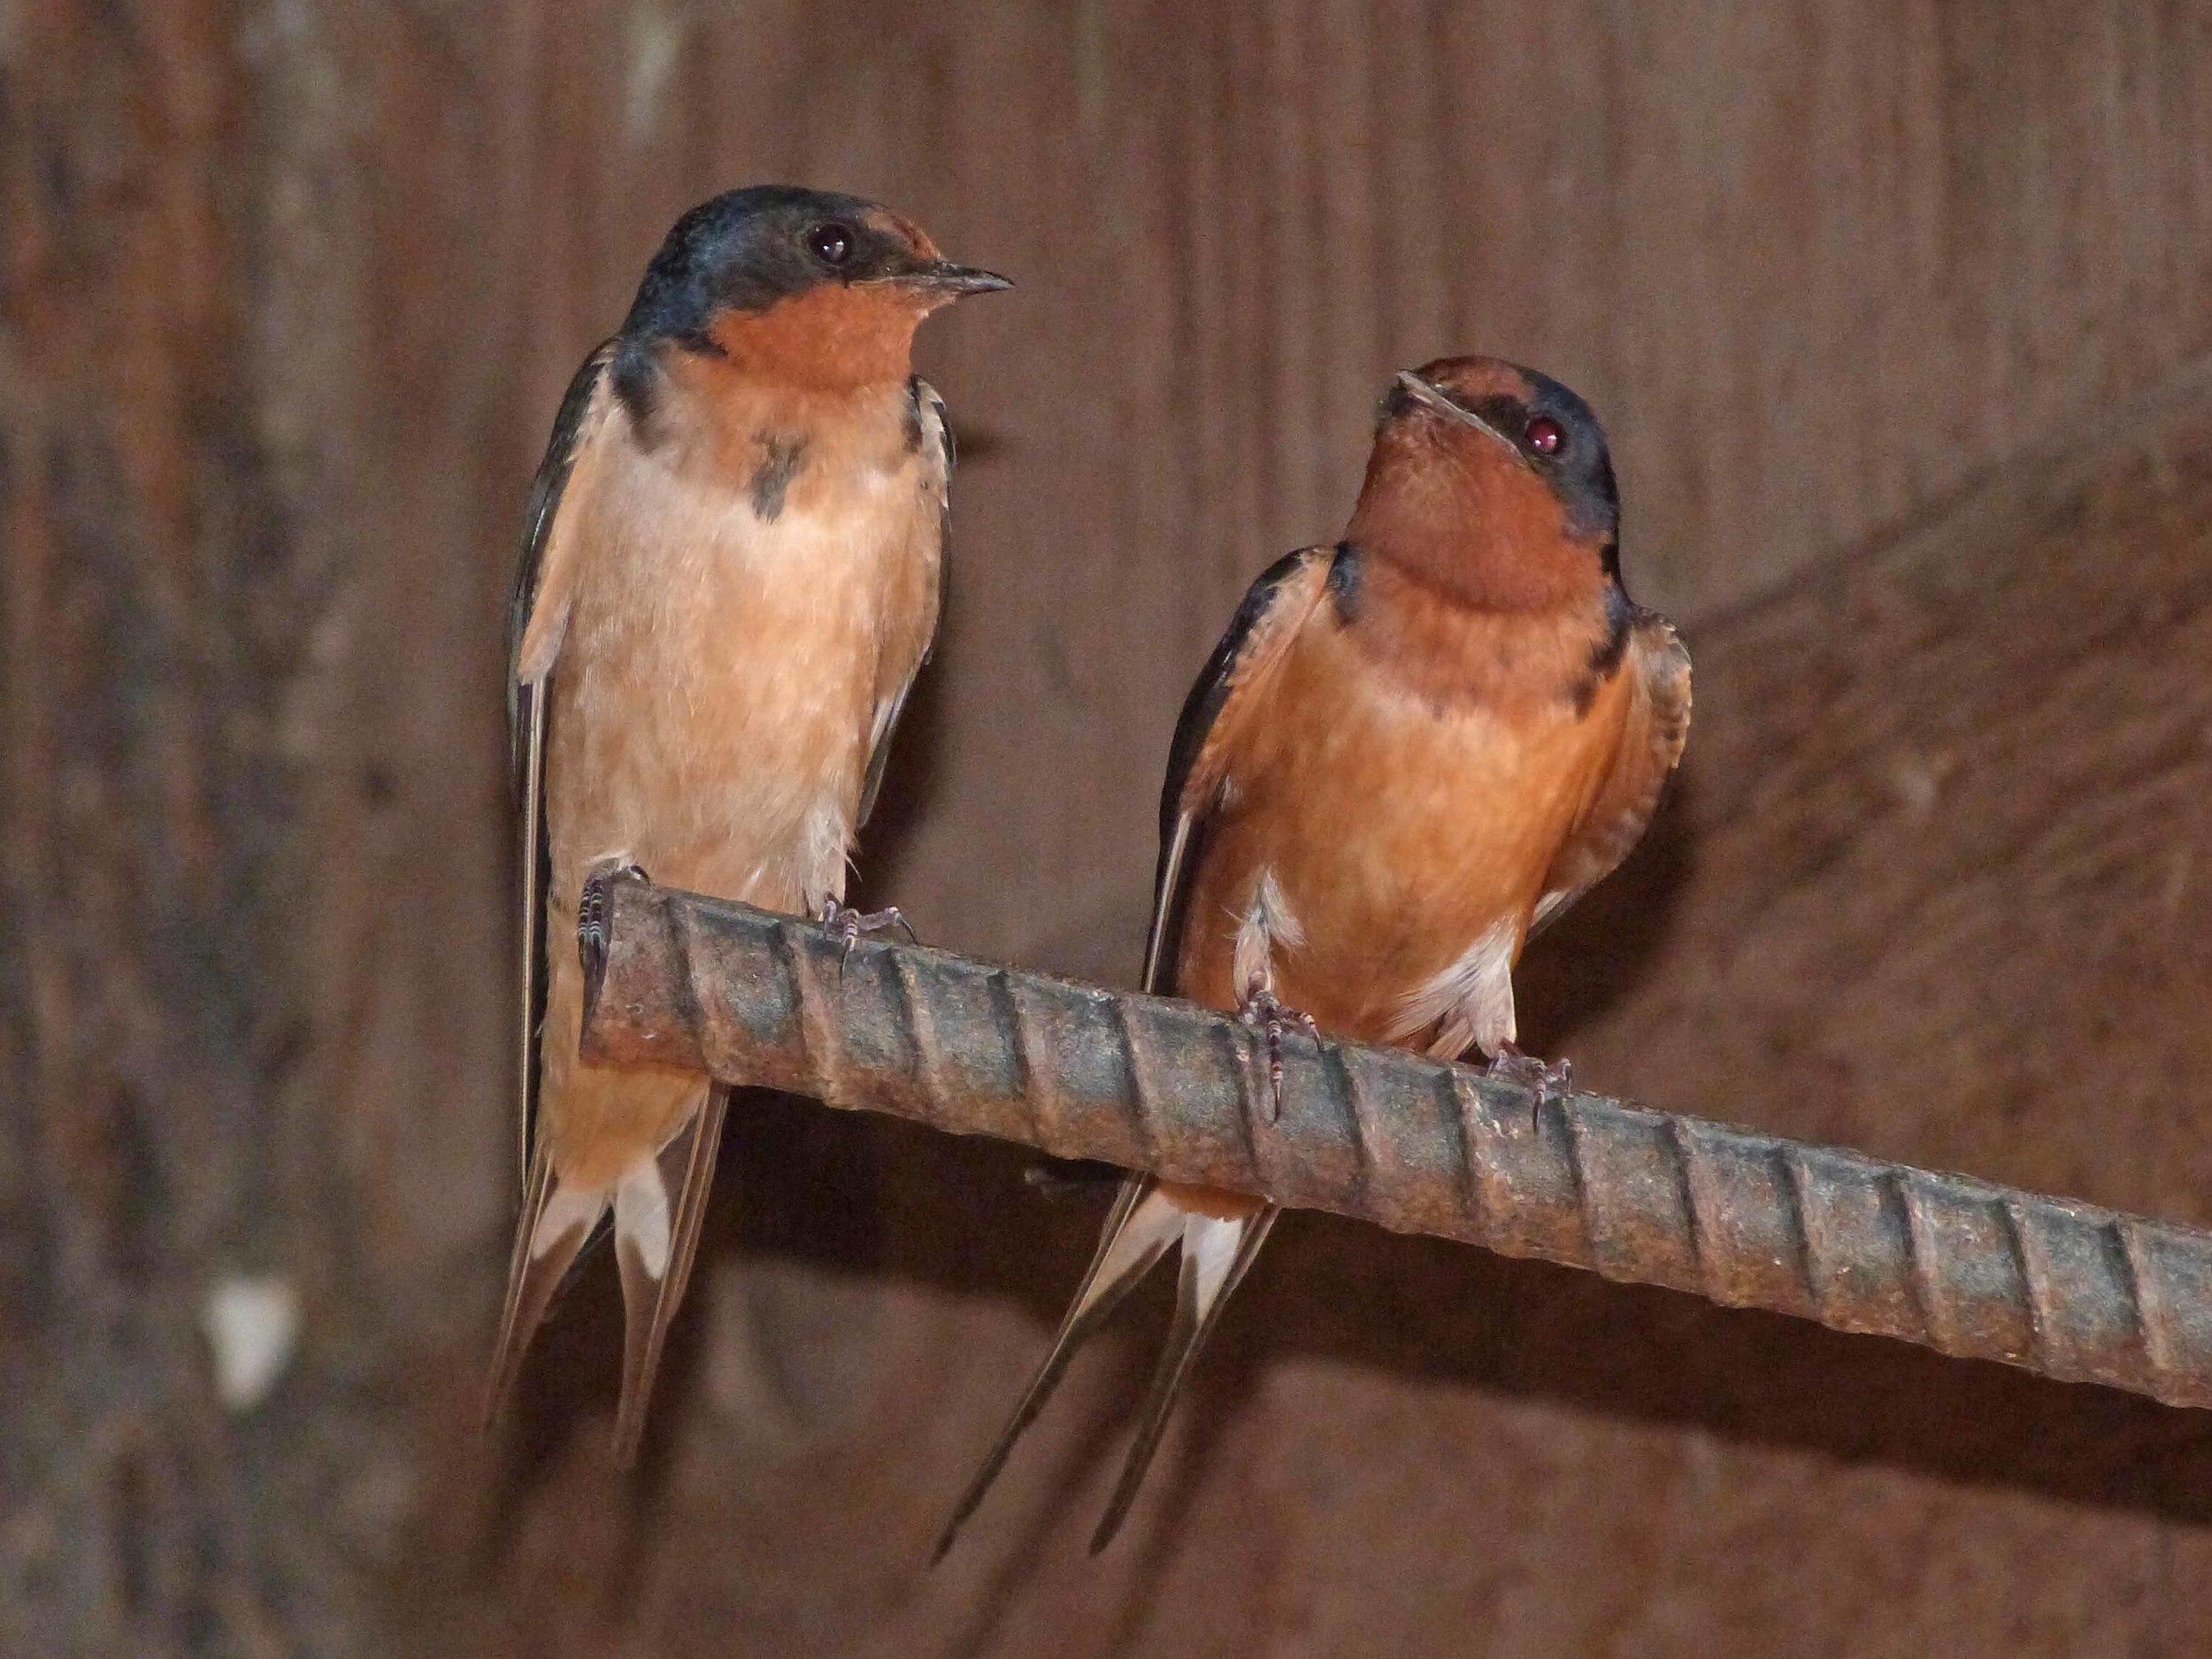 bcs P1060483 Barn swallows.jpg